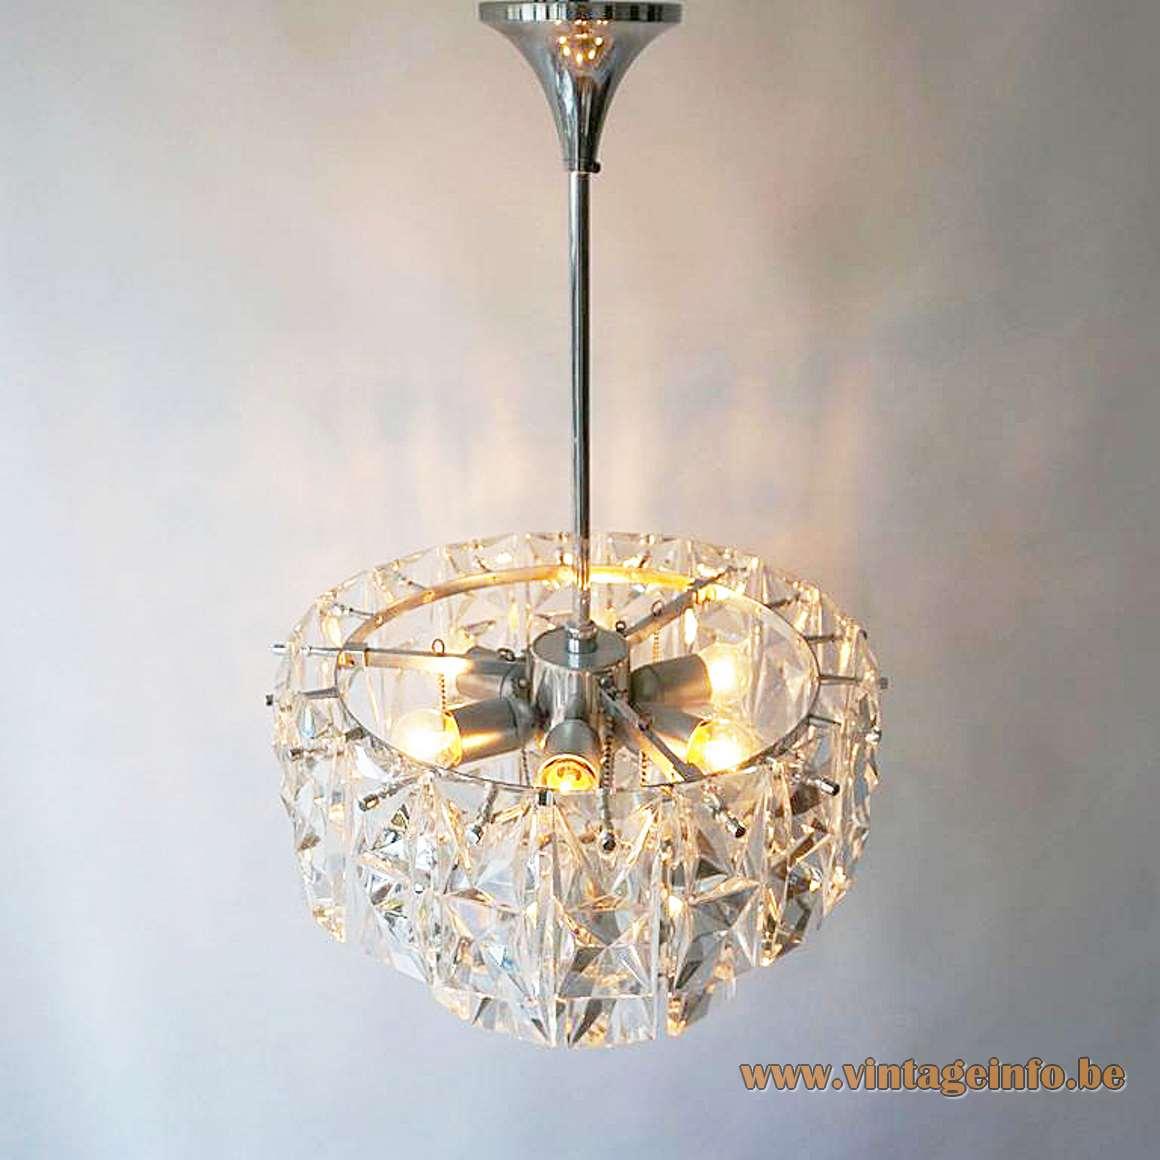 Kinkeldey 3 tier crystal prism chandelier multifaceted cut glass chrome frame rods 1960s 1970s Germany